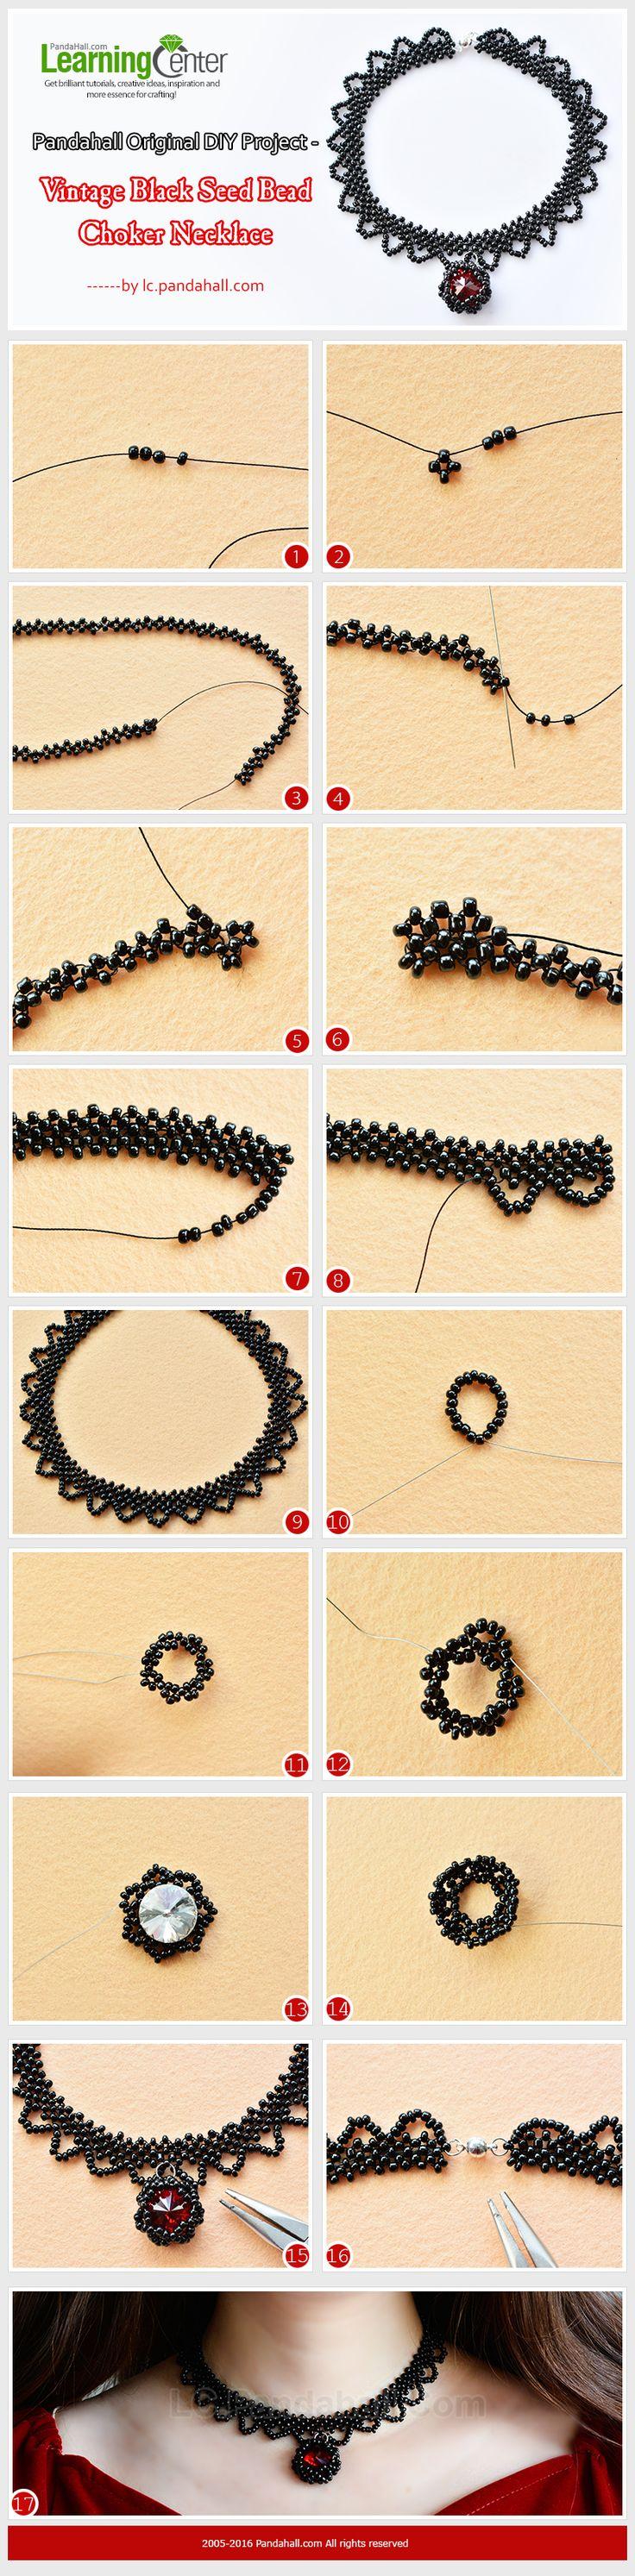 Original DIY Project - Vintage Black Seed Bead Choker Necklace from LC.Pandahall.com  #pandahall